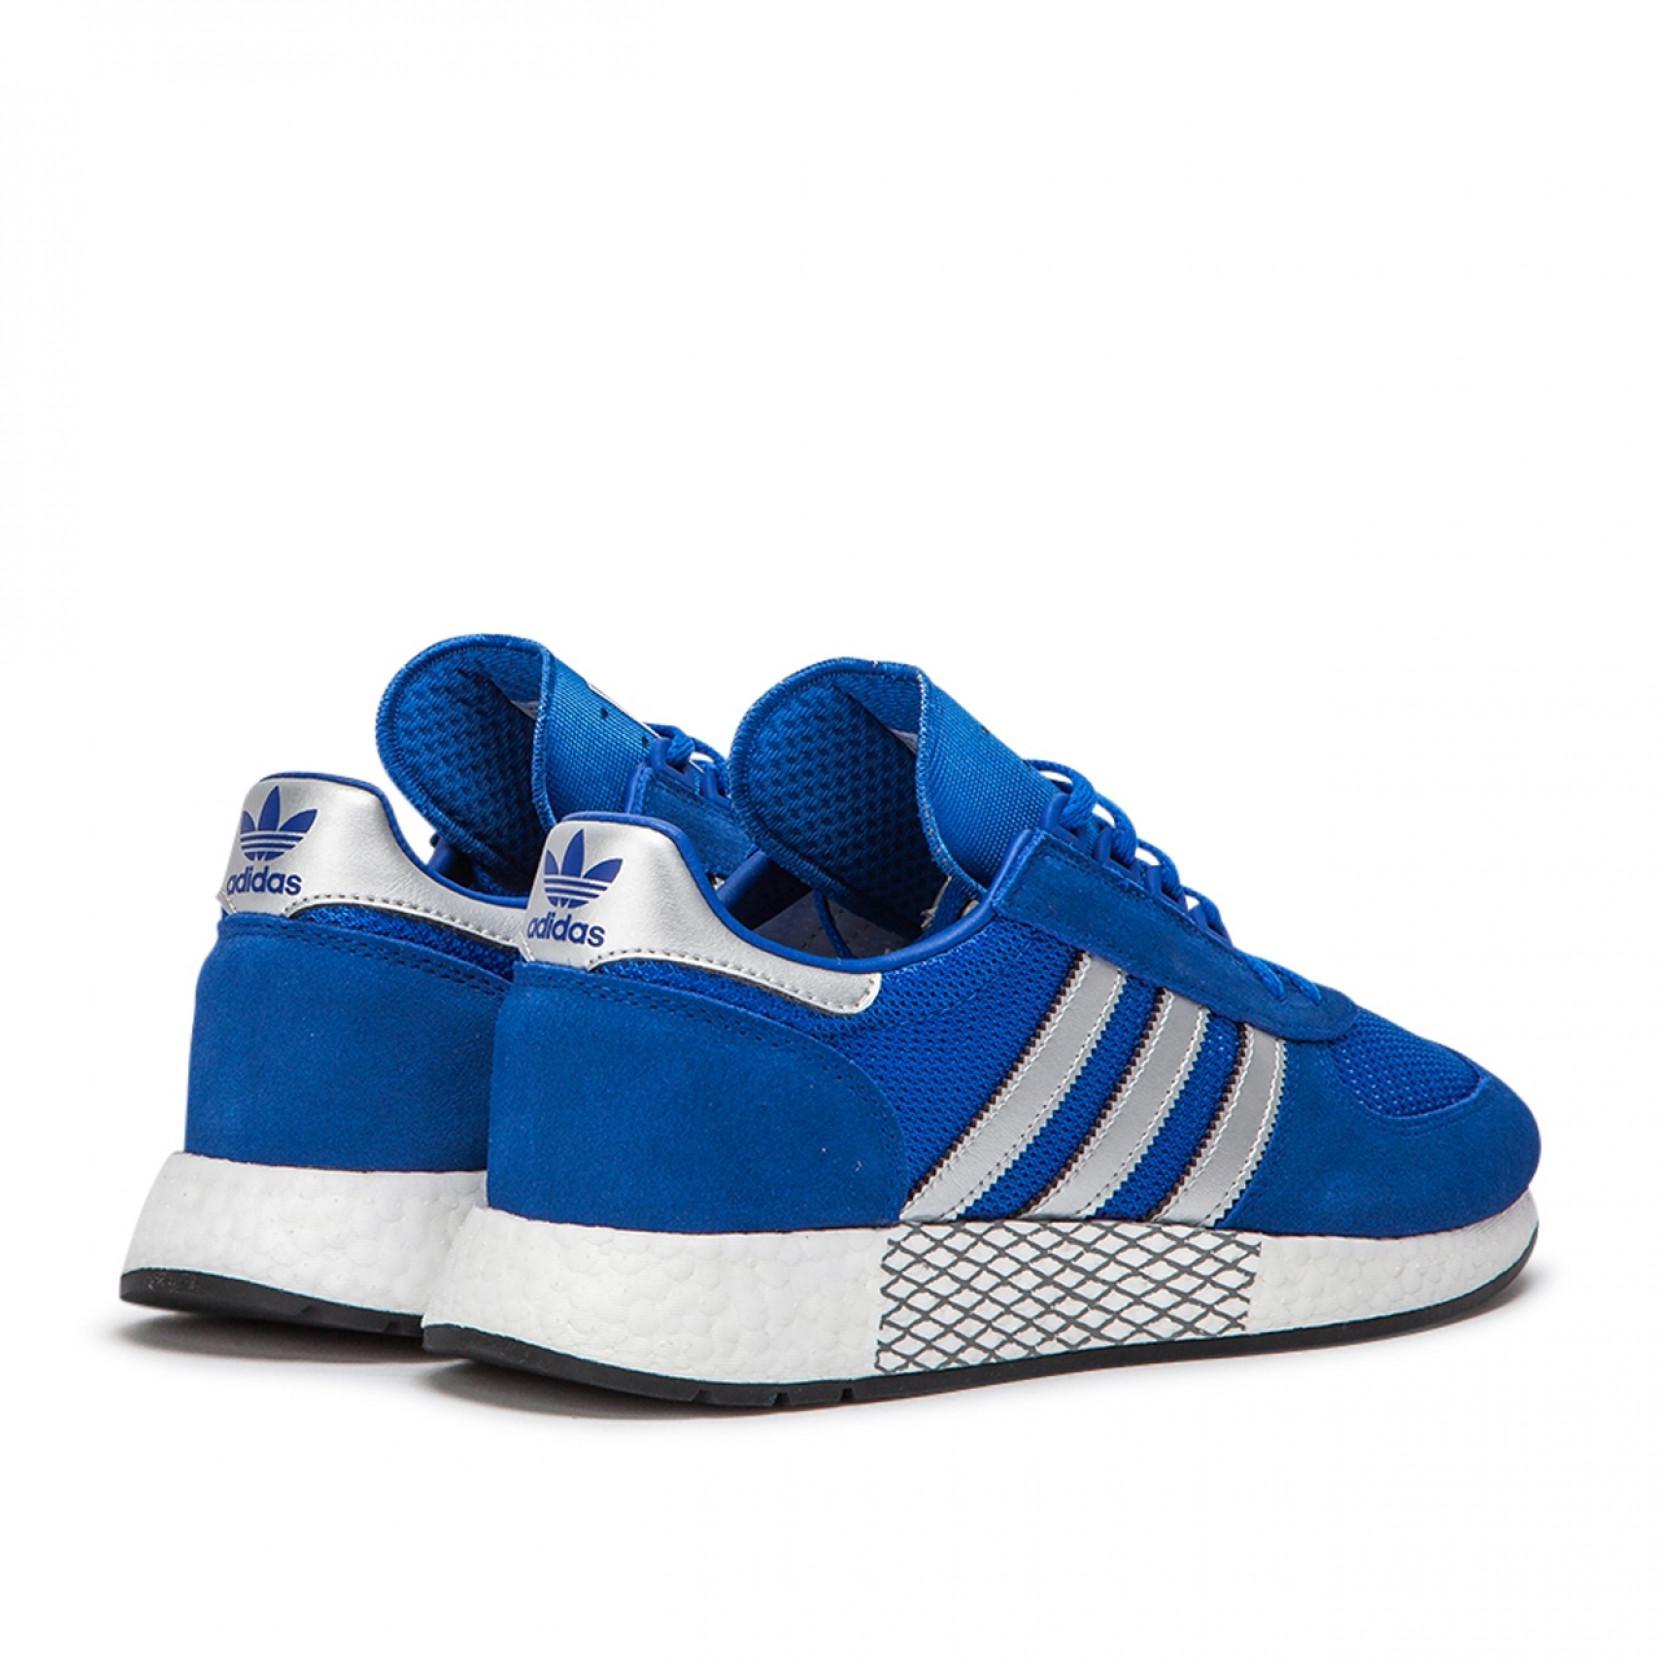 adidas Marathon X 5923 in Blue for Men